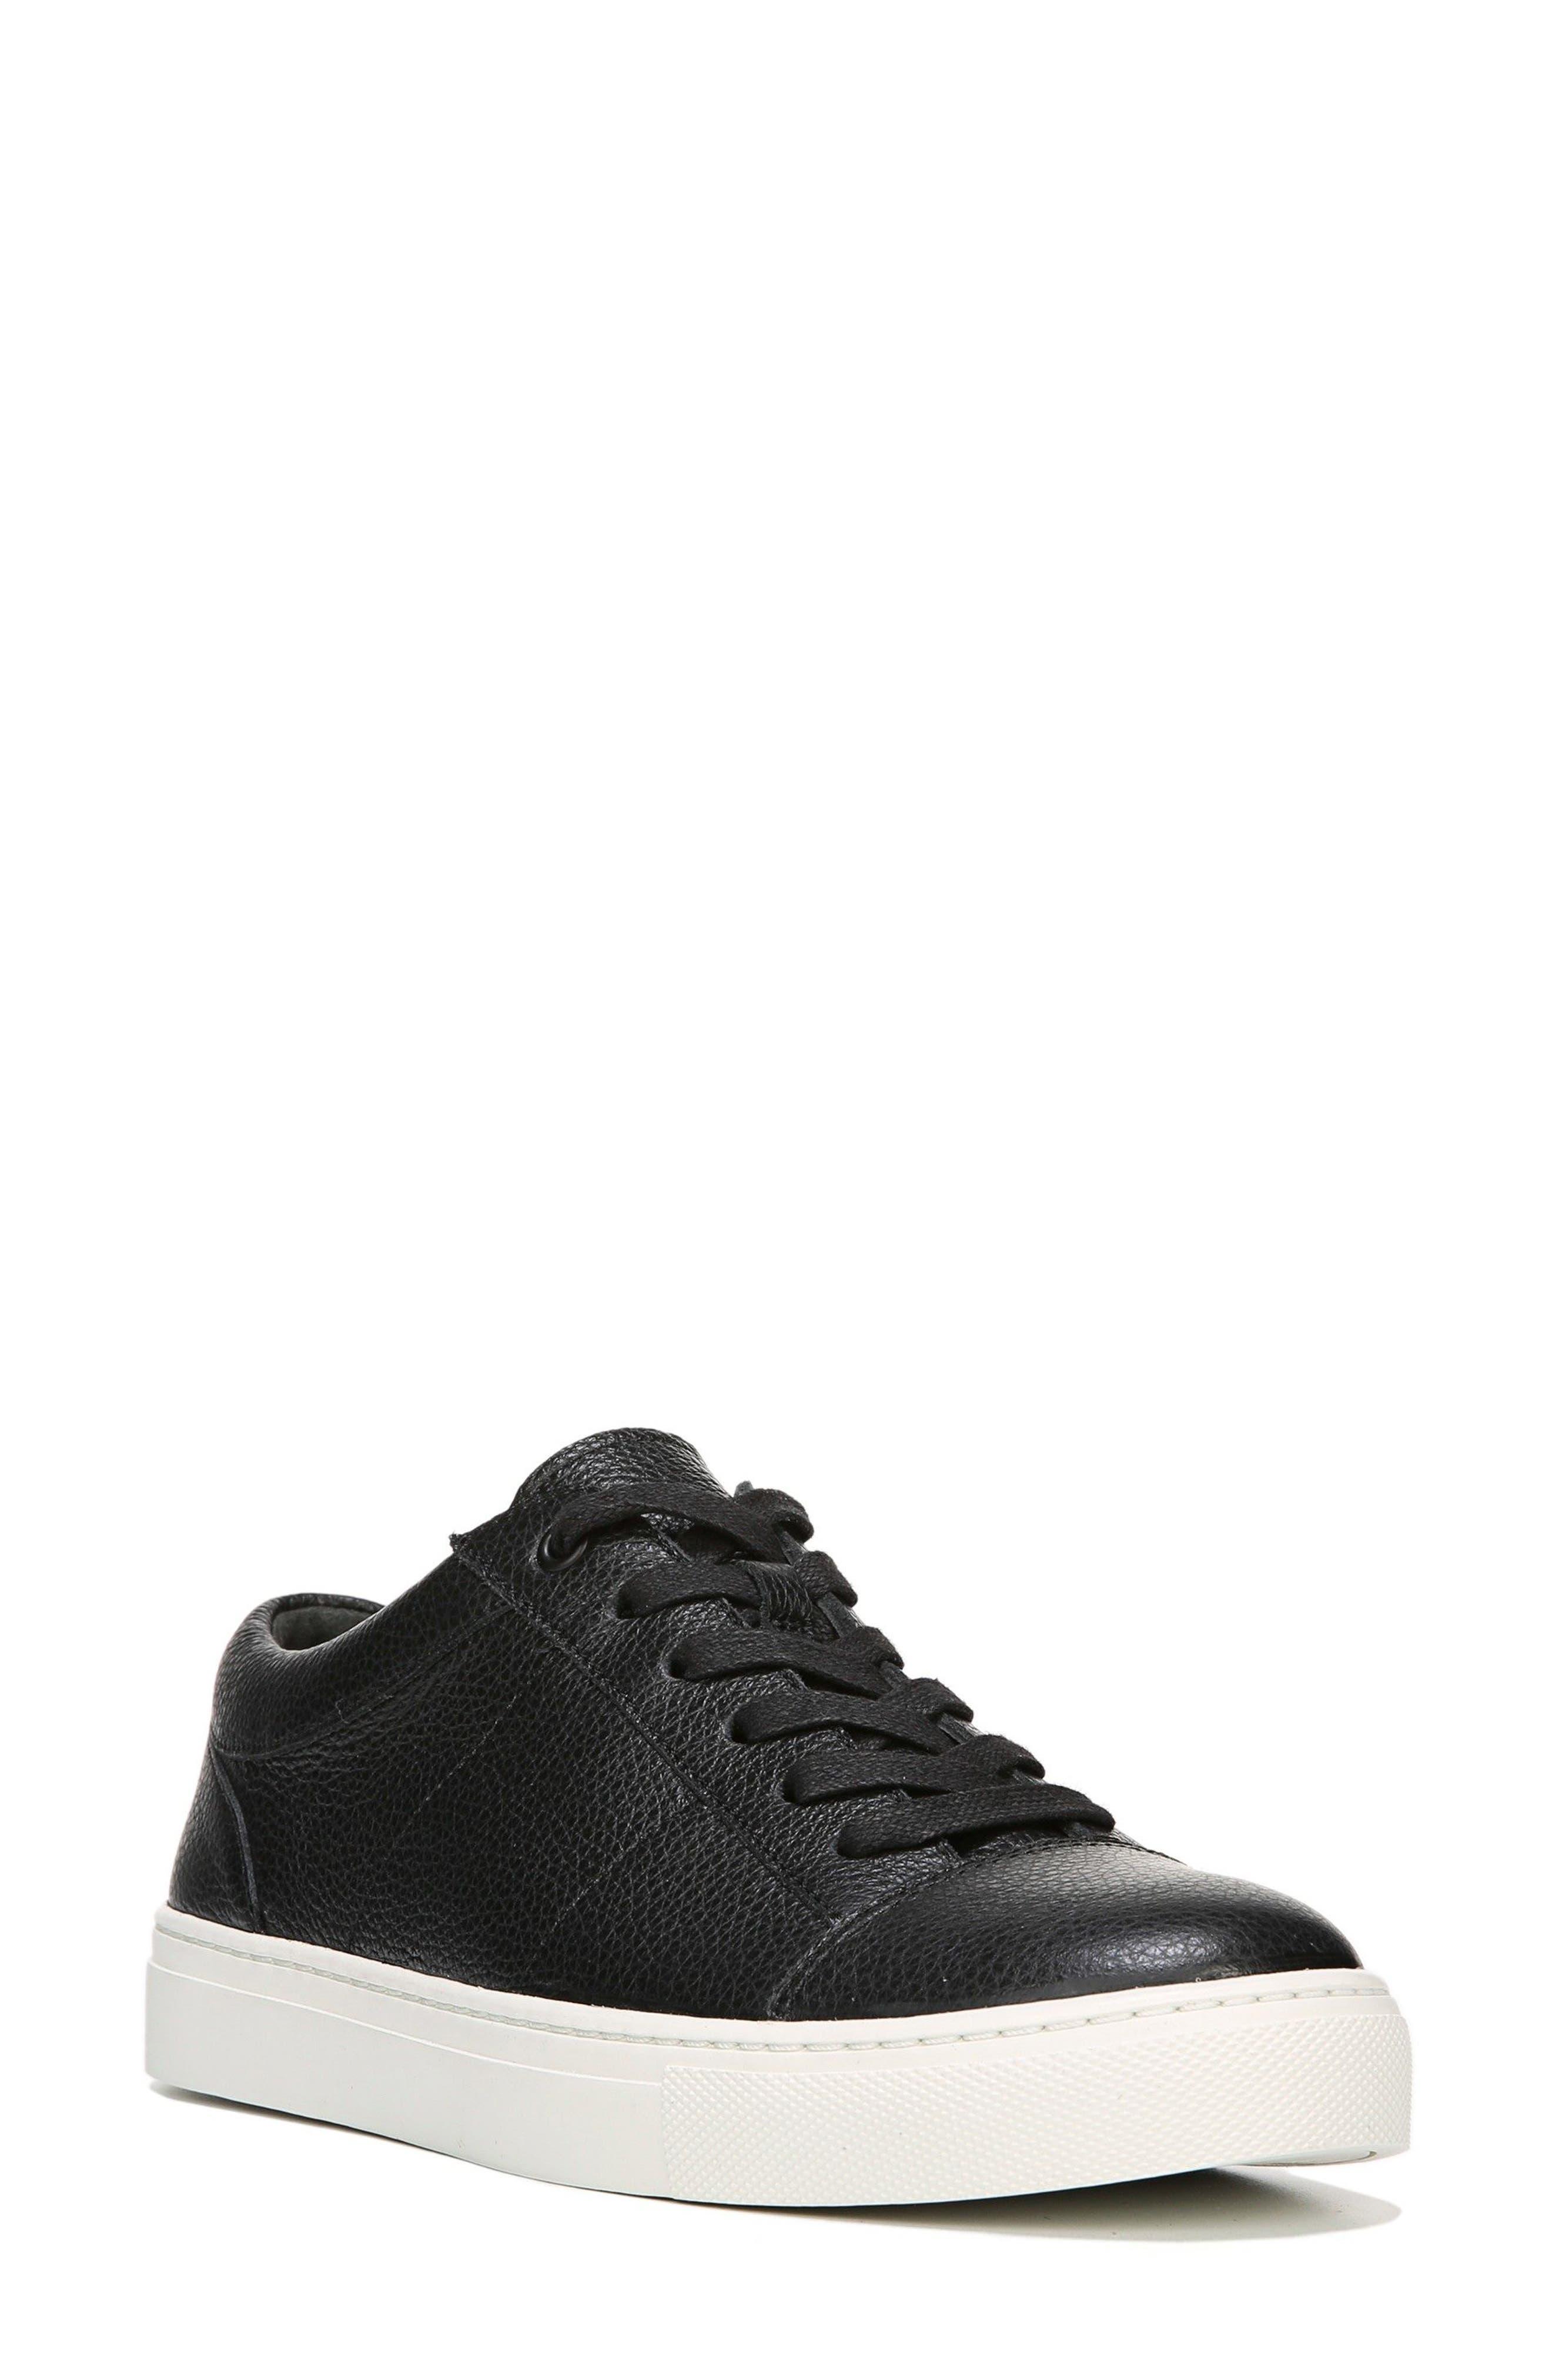 Afton Sneaker,                         Main,                         color, 001